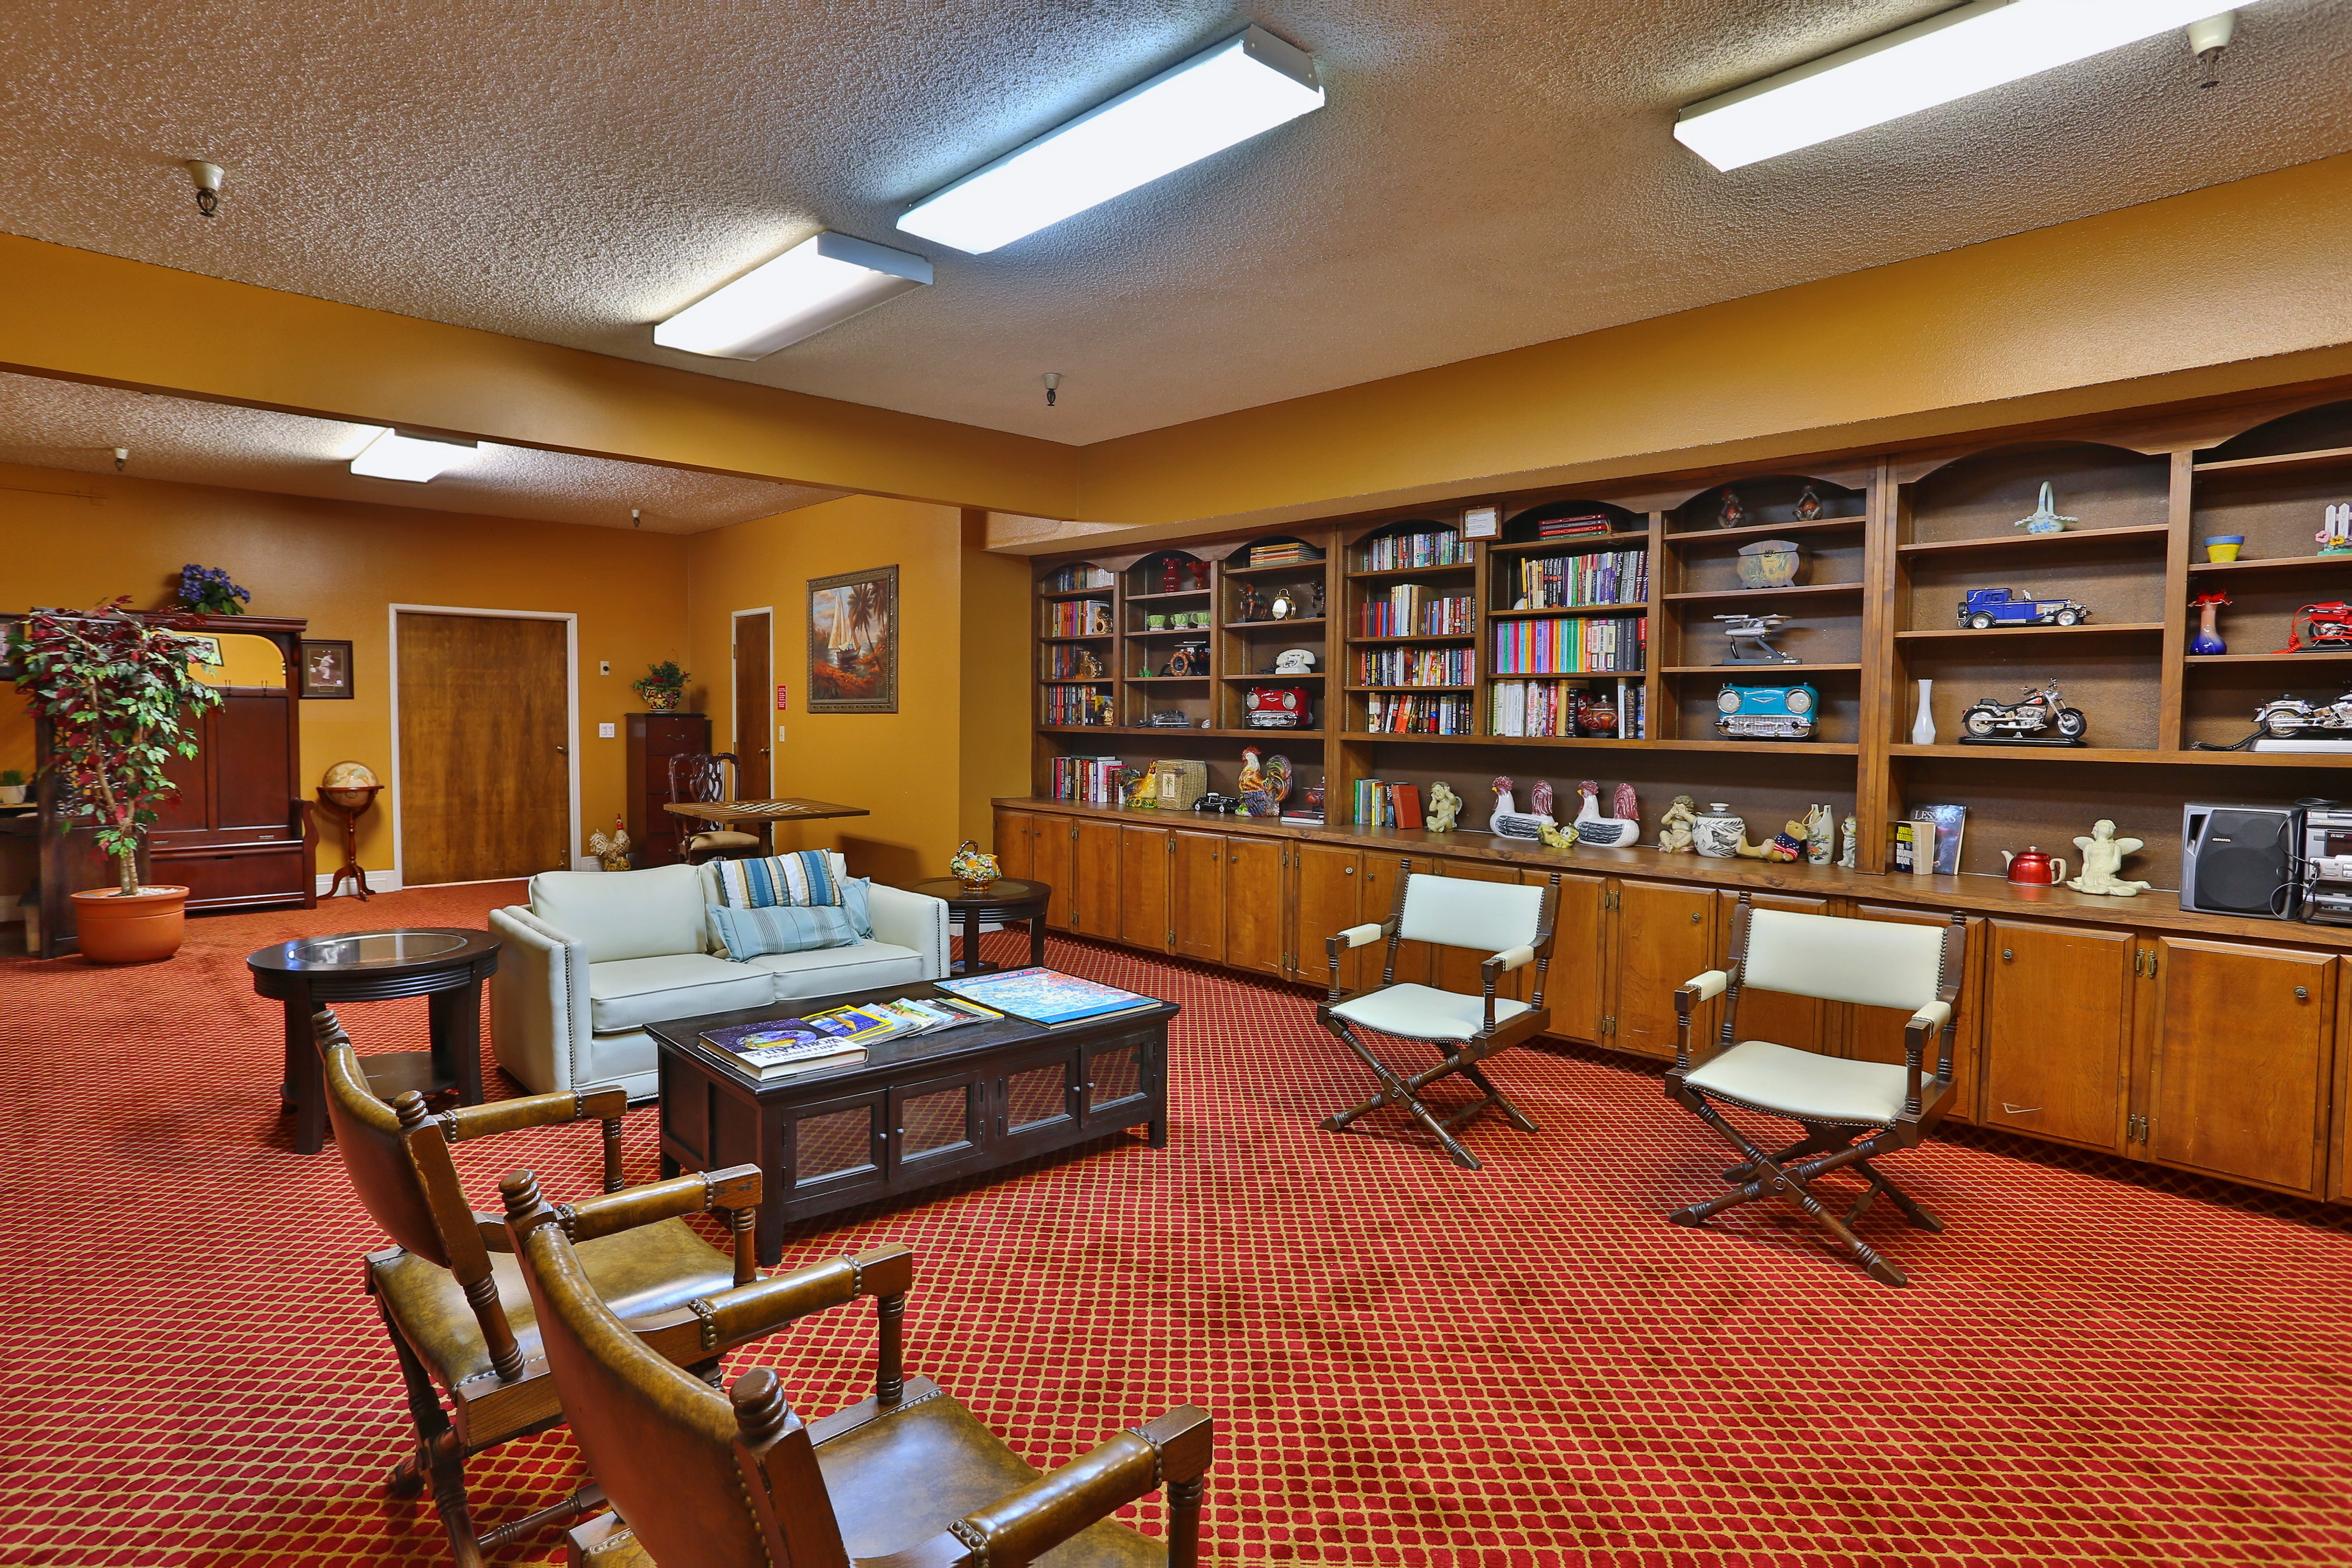 Villa Redondo Library